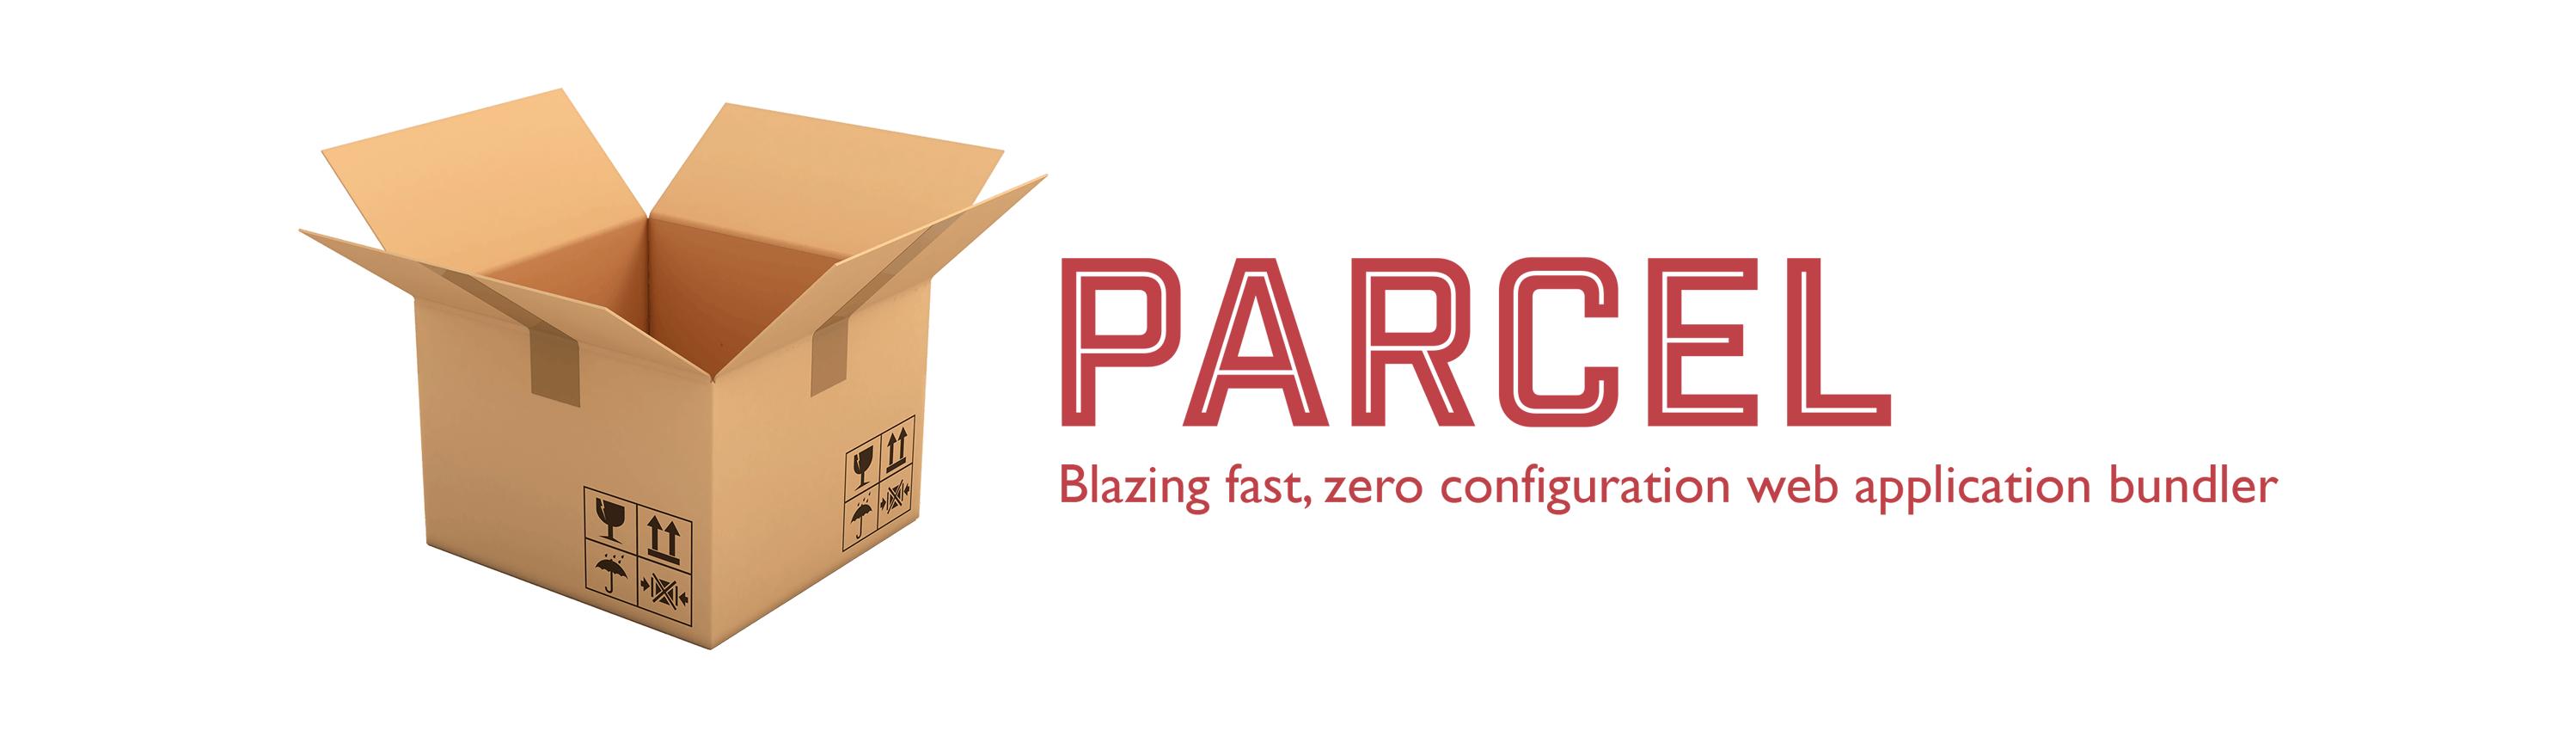 Parceljs'i denemek